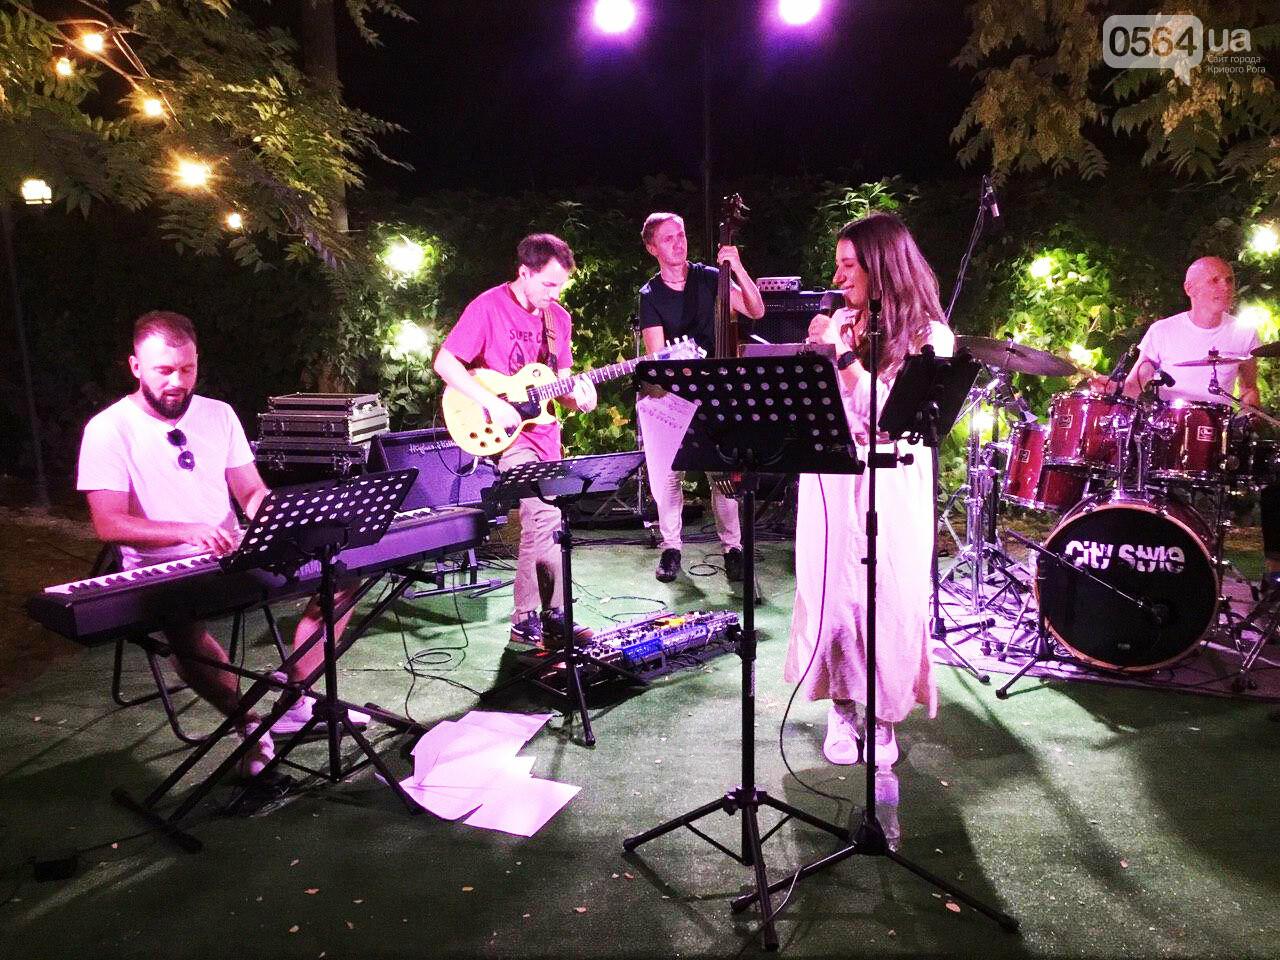 Под звездным небом криворожане наслаждались летним джазом от  Advantage Project, - ФОТО, ВИДЕО , фото-1